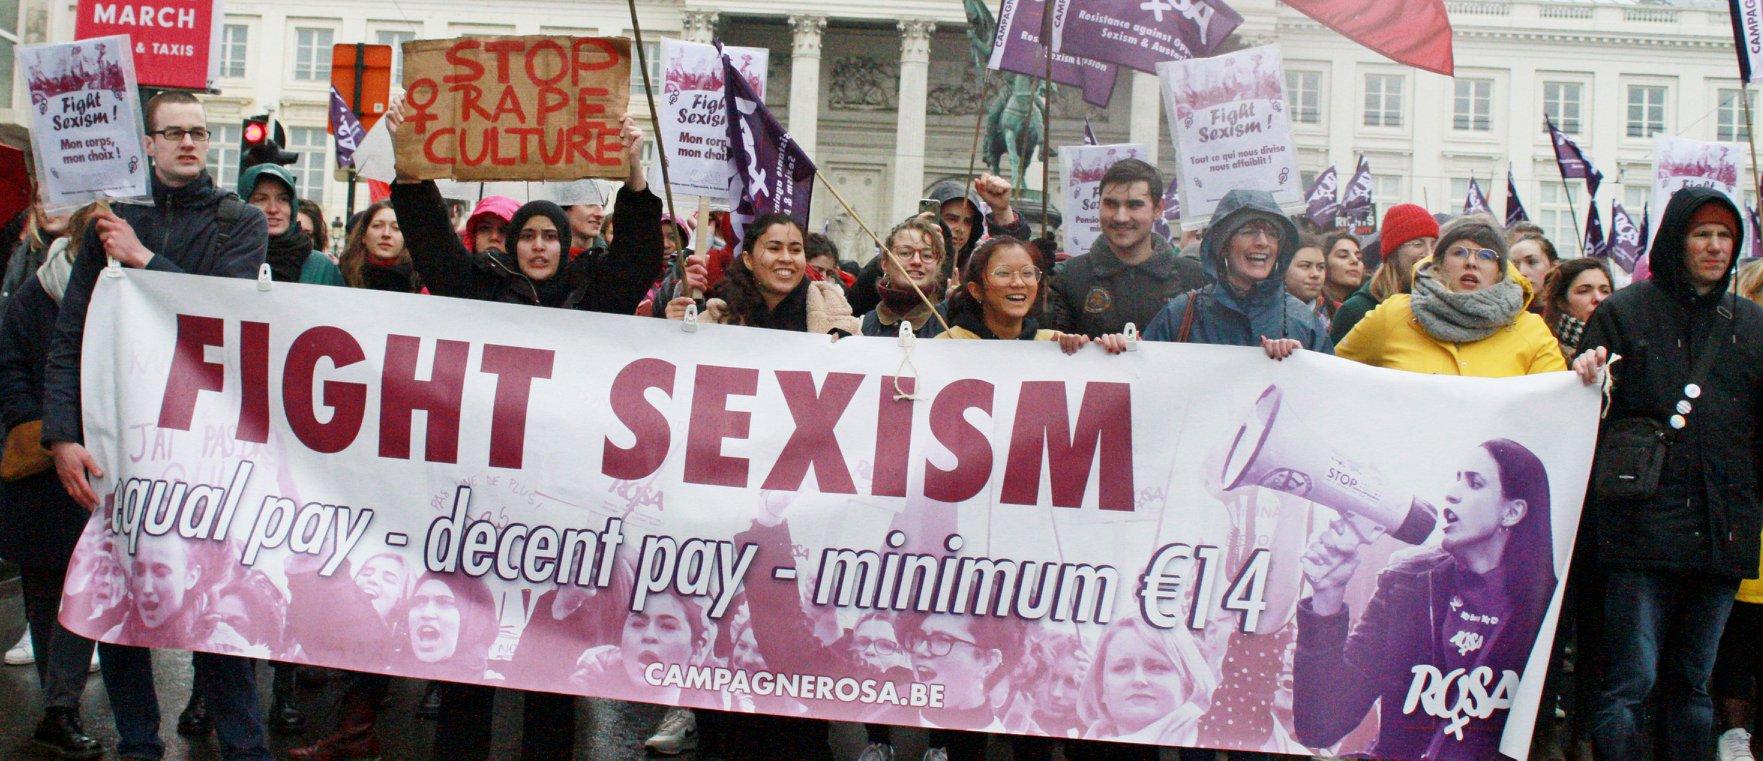 Debatten binnen het feminisme: waarom socialistisch feminisme?